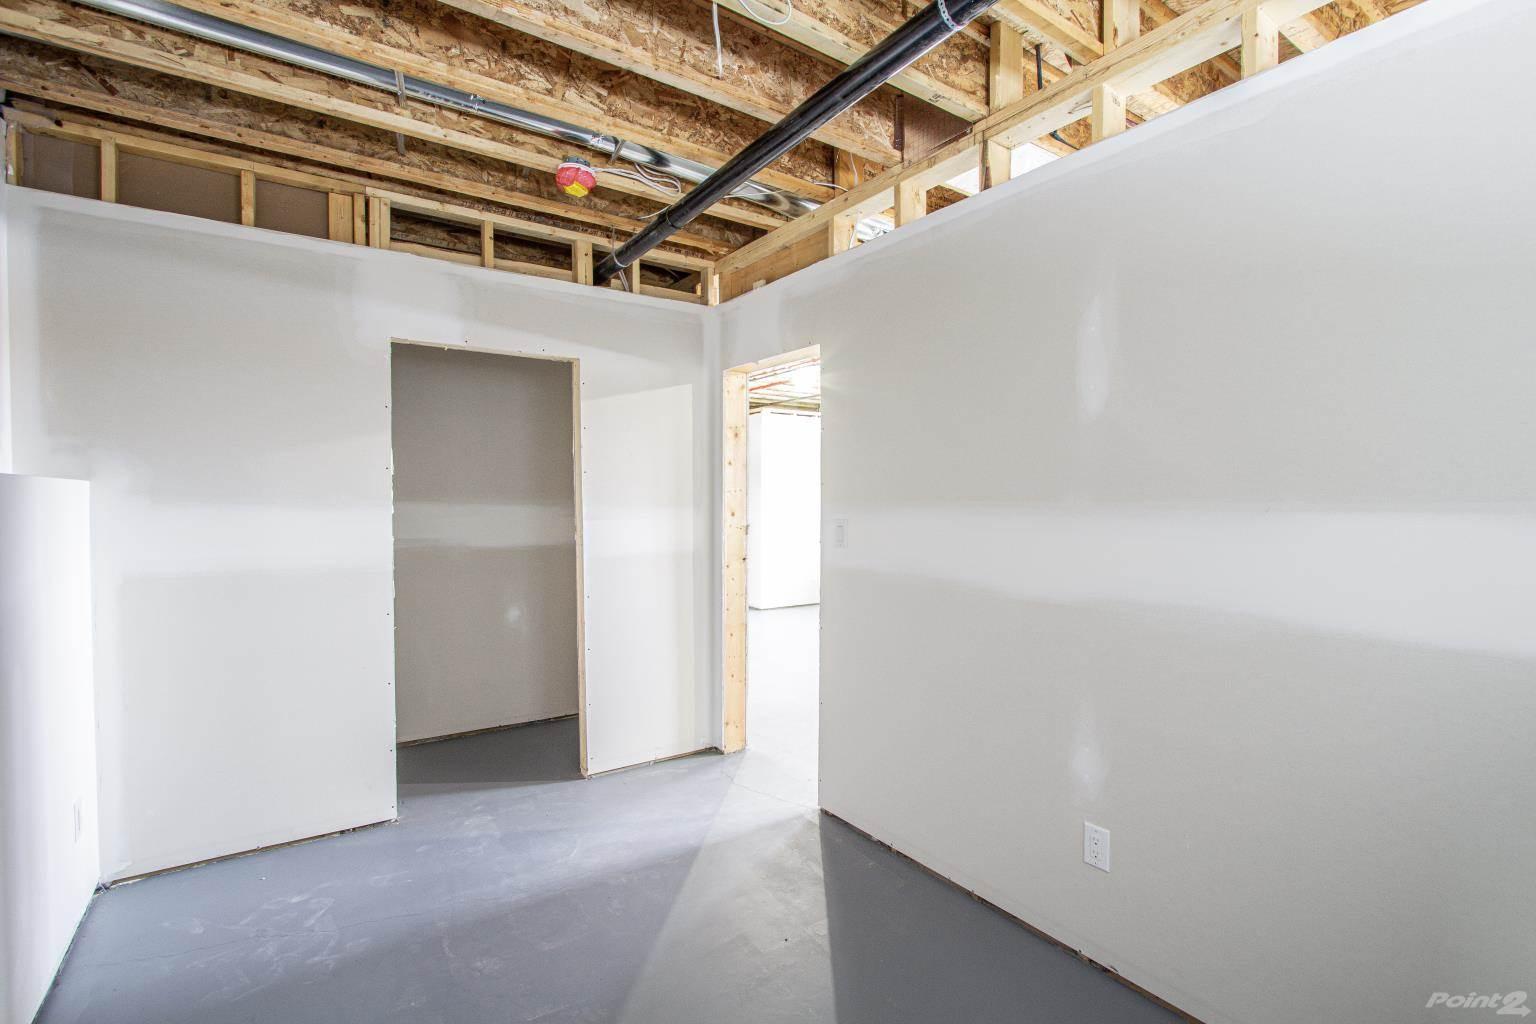 215 Terra Nova Cres in Cold Lake - House For Sale : MLS# e4225242 Photo 13